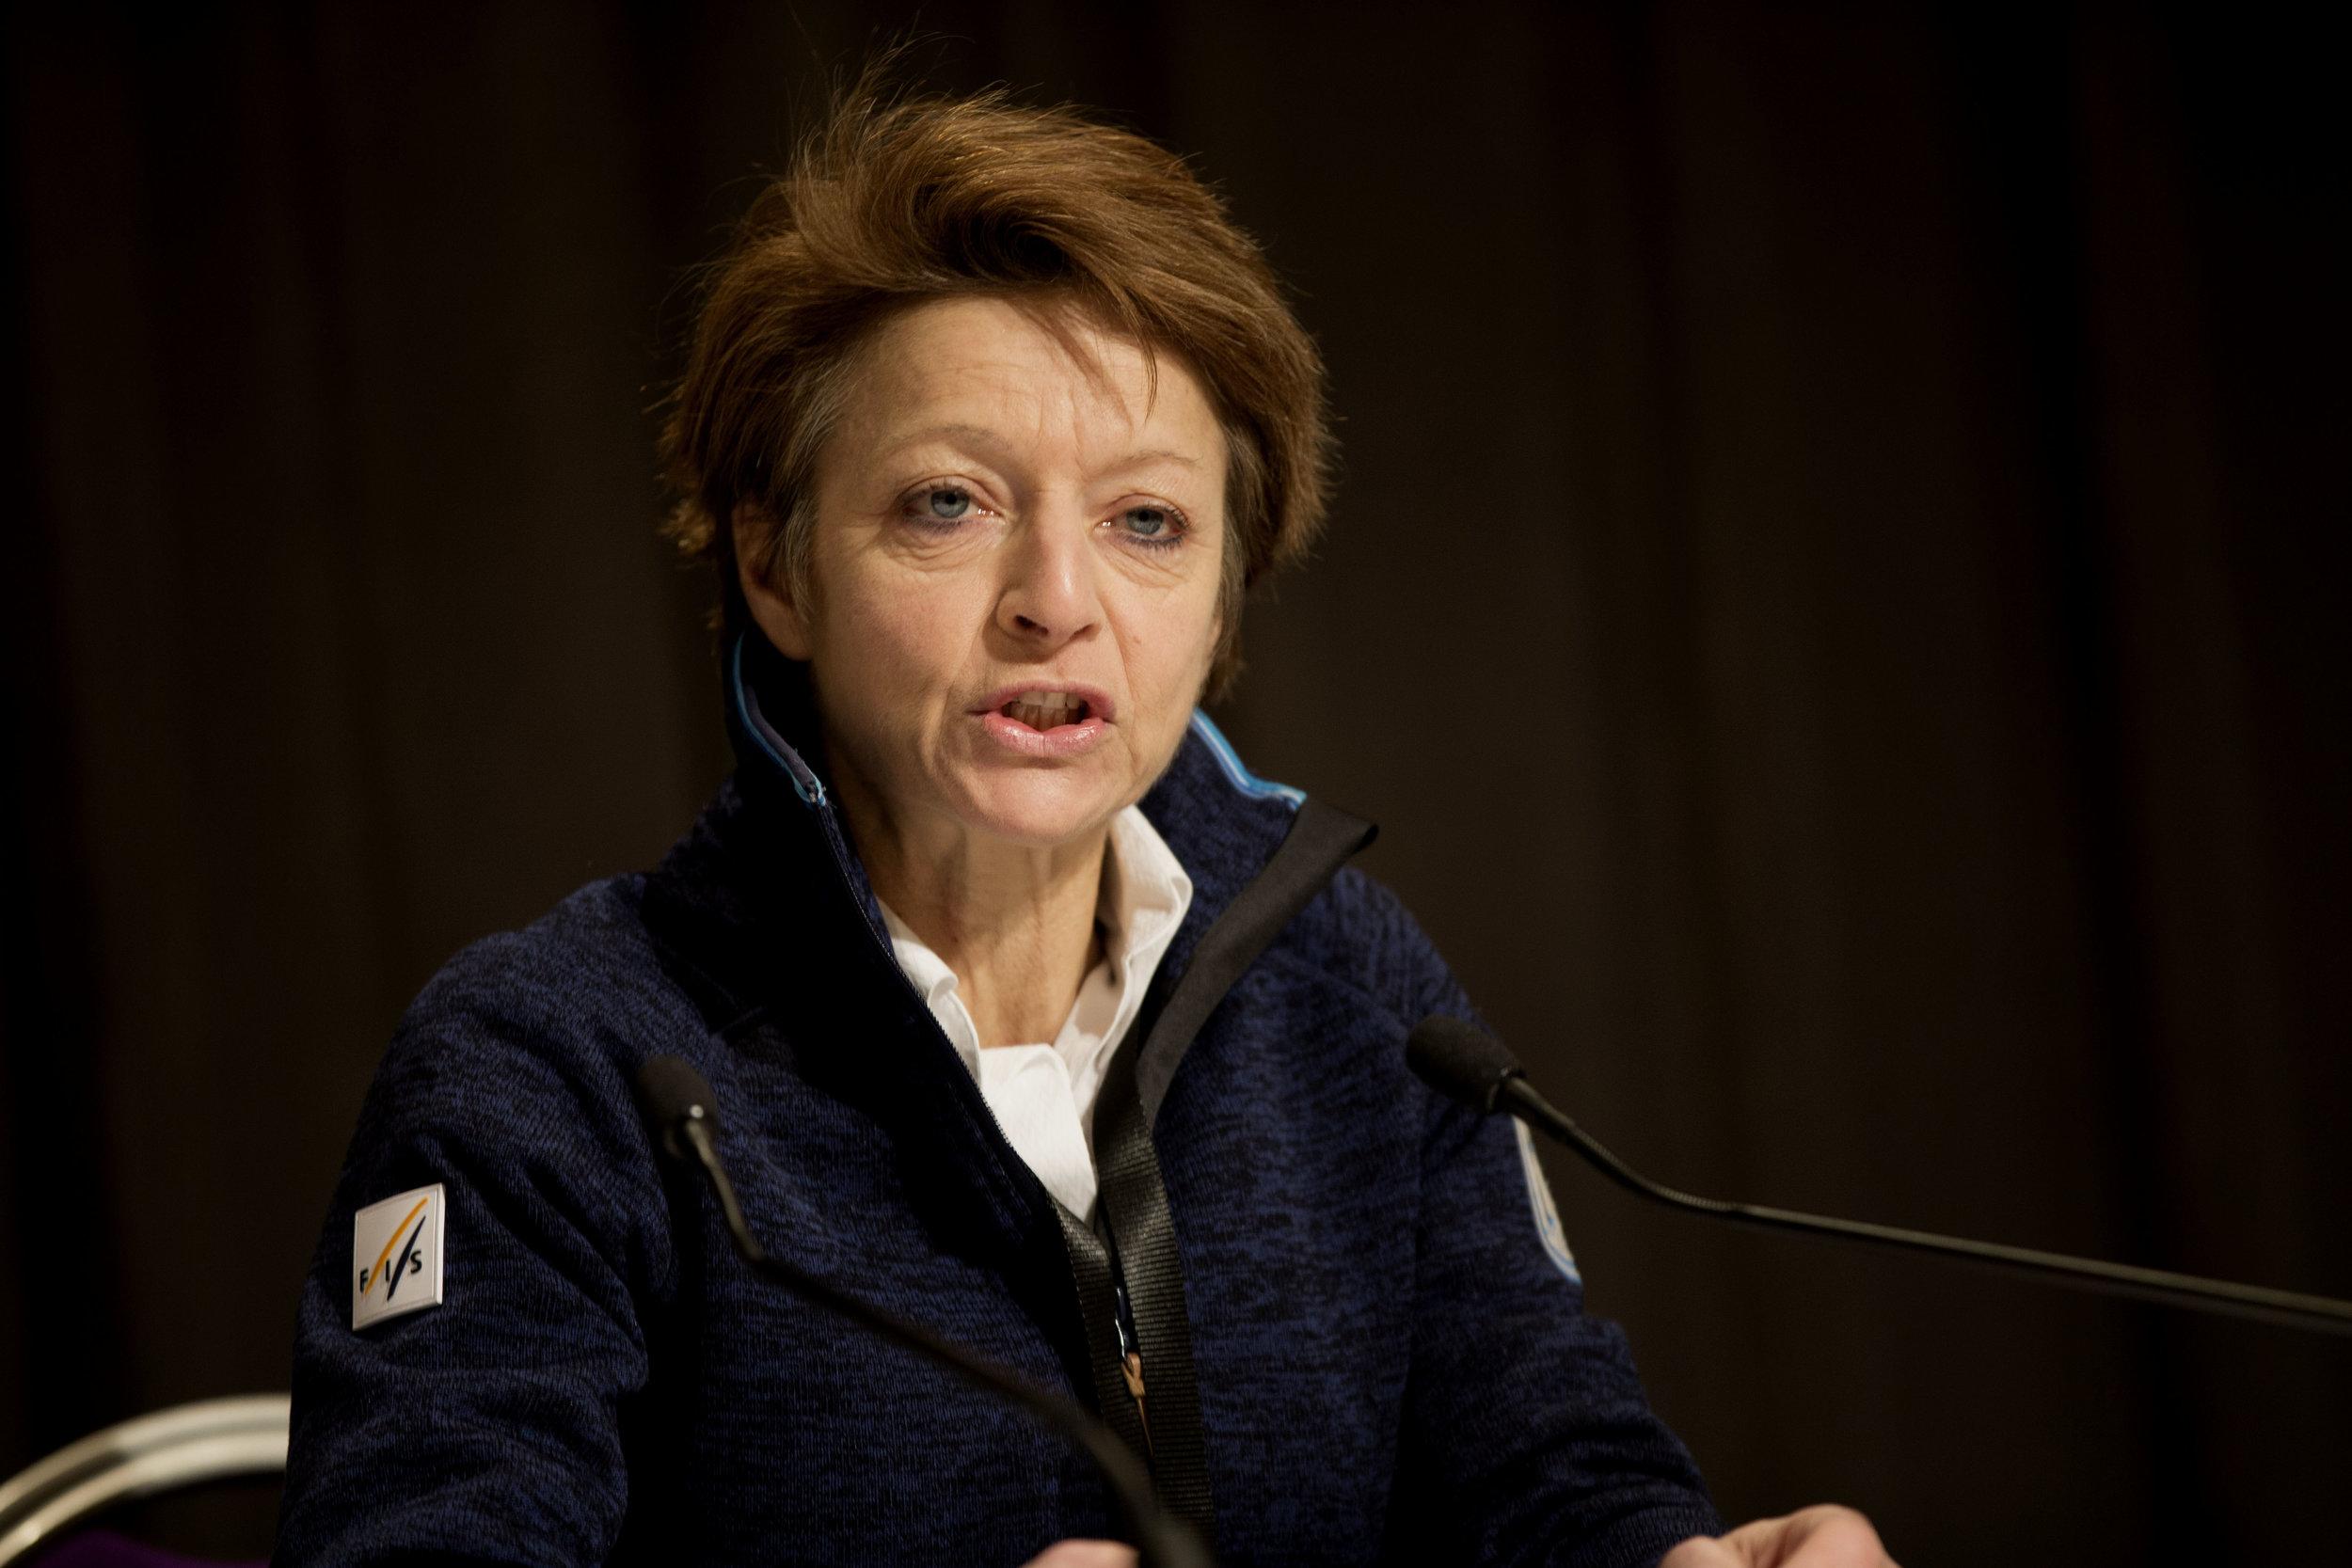 Sarah Lewis er generalsekretær i det internasjonale skiforbundet FIS. FOTO: Geir Olsen/NTB scanpix